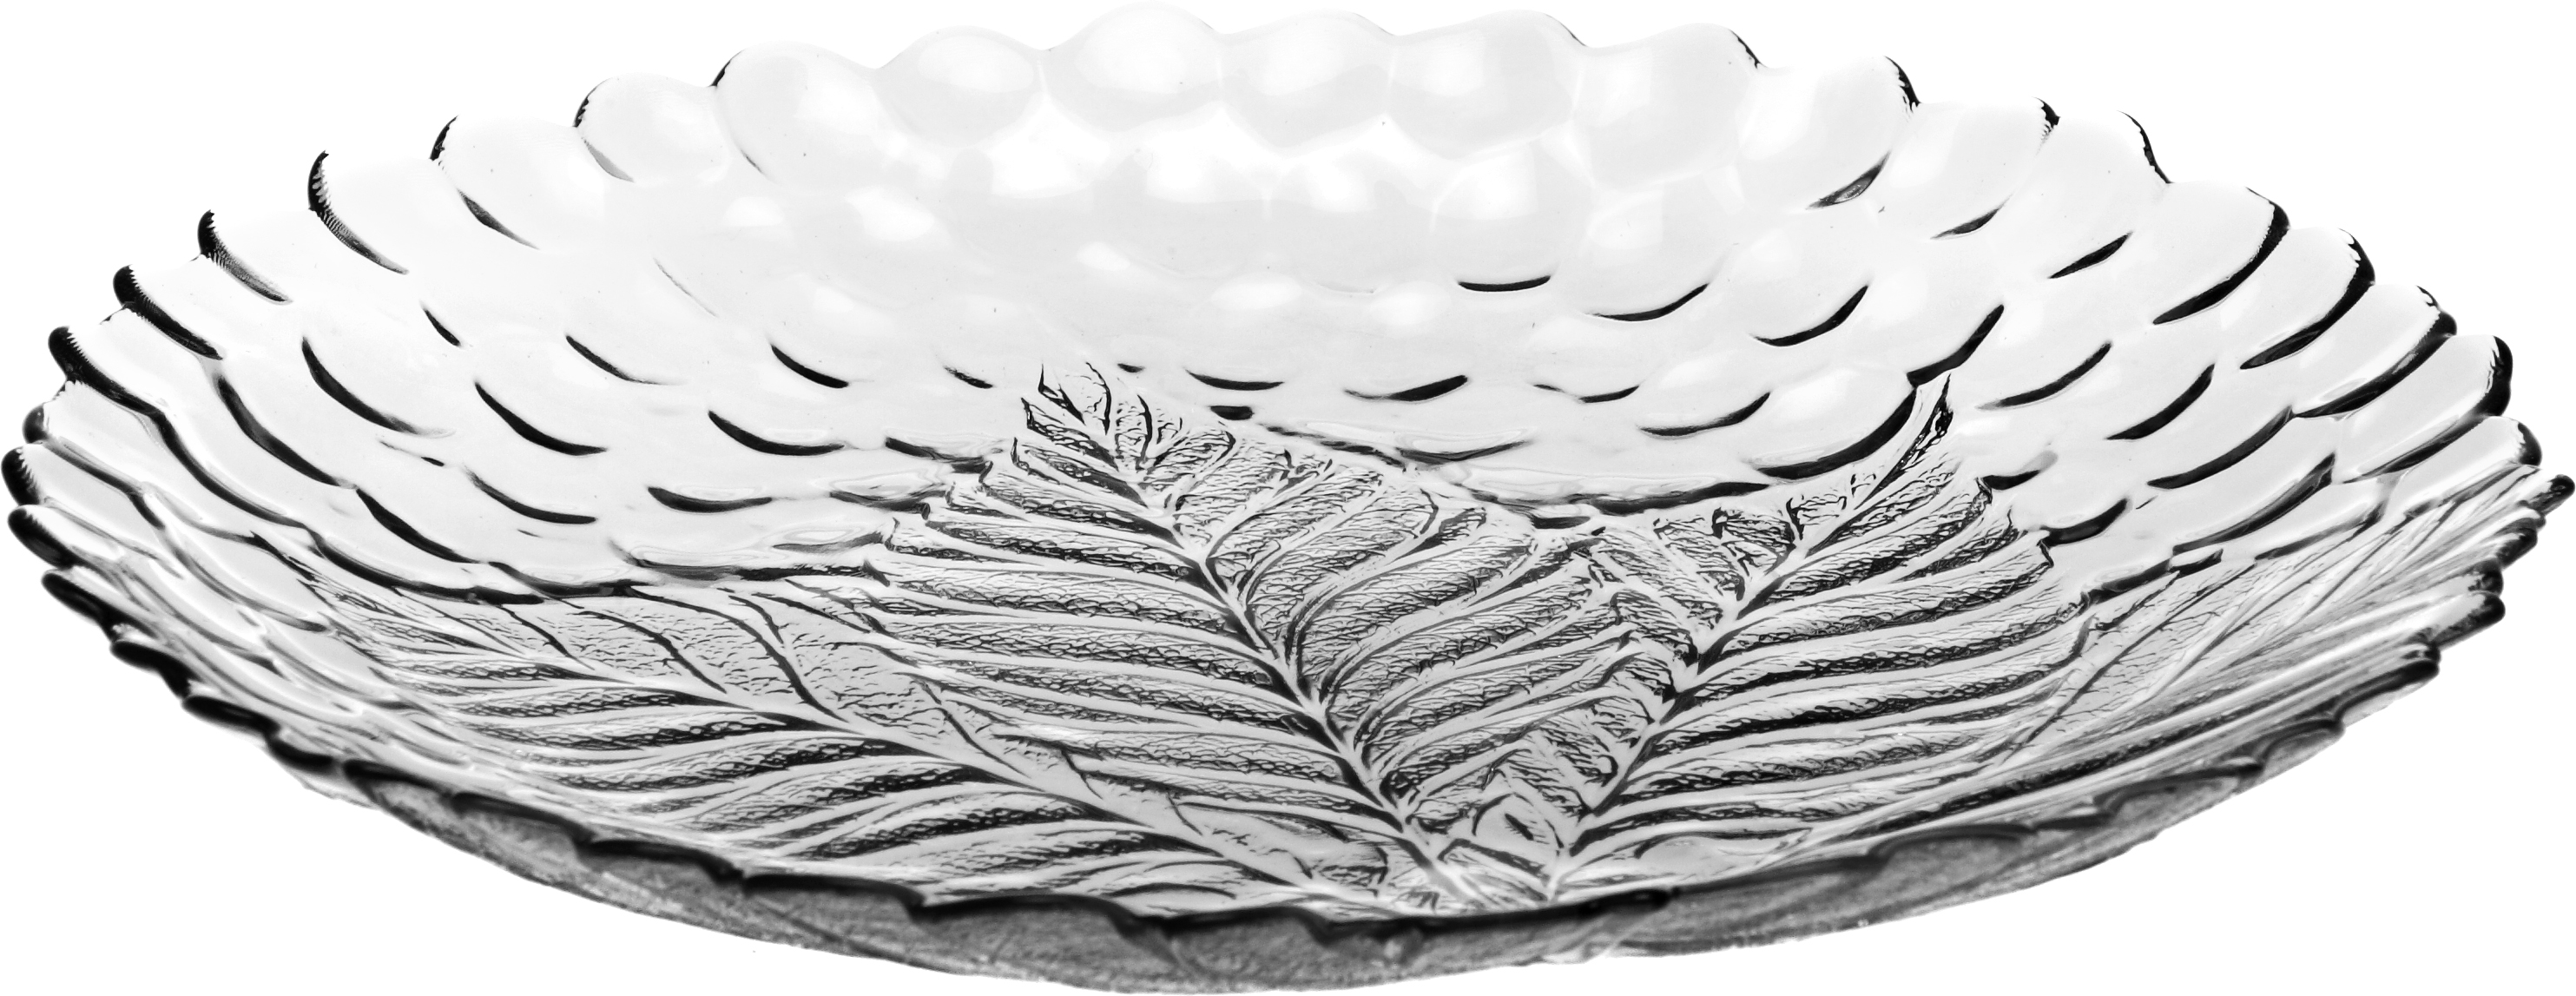 Тарелка Pasabahce Султана, цвет: прозрачный, диаметр 24 см10288SLBТарелка SULTANA d=240 мм (прозрачное рифленое стекло)